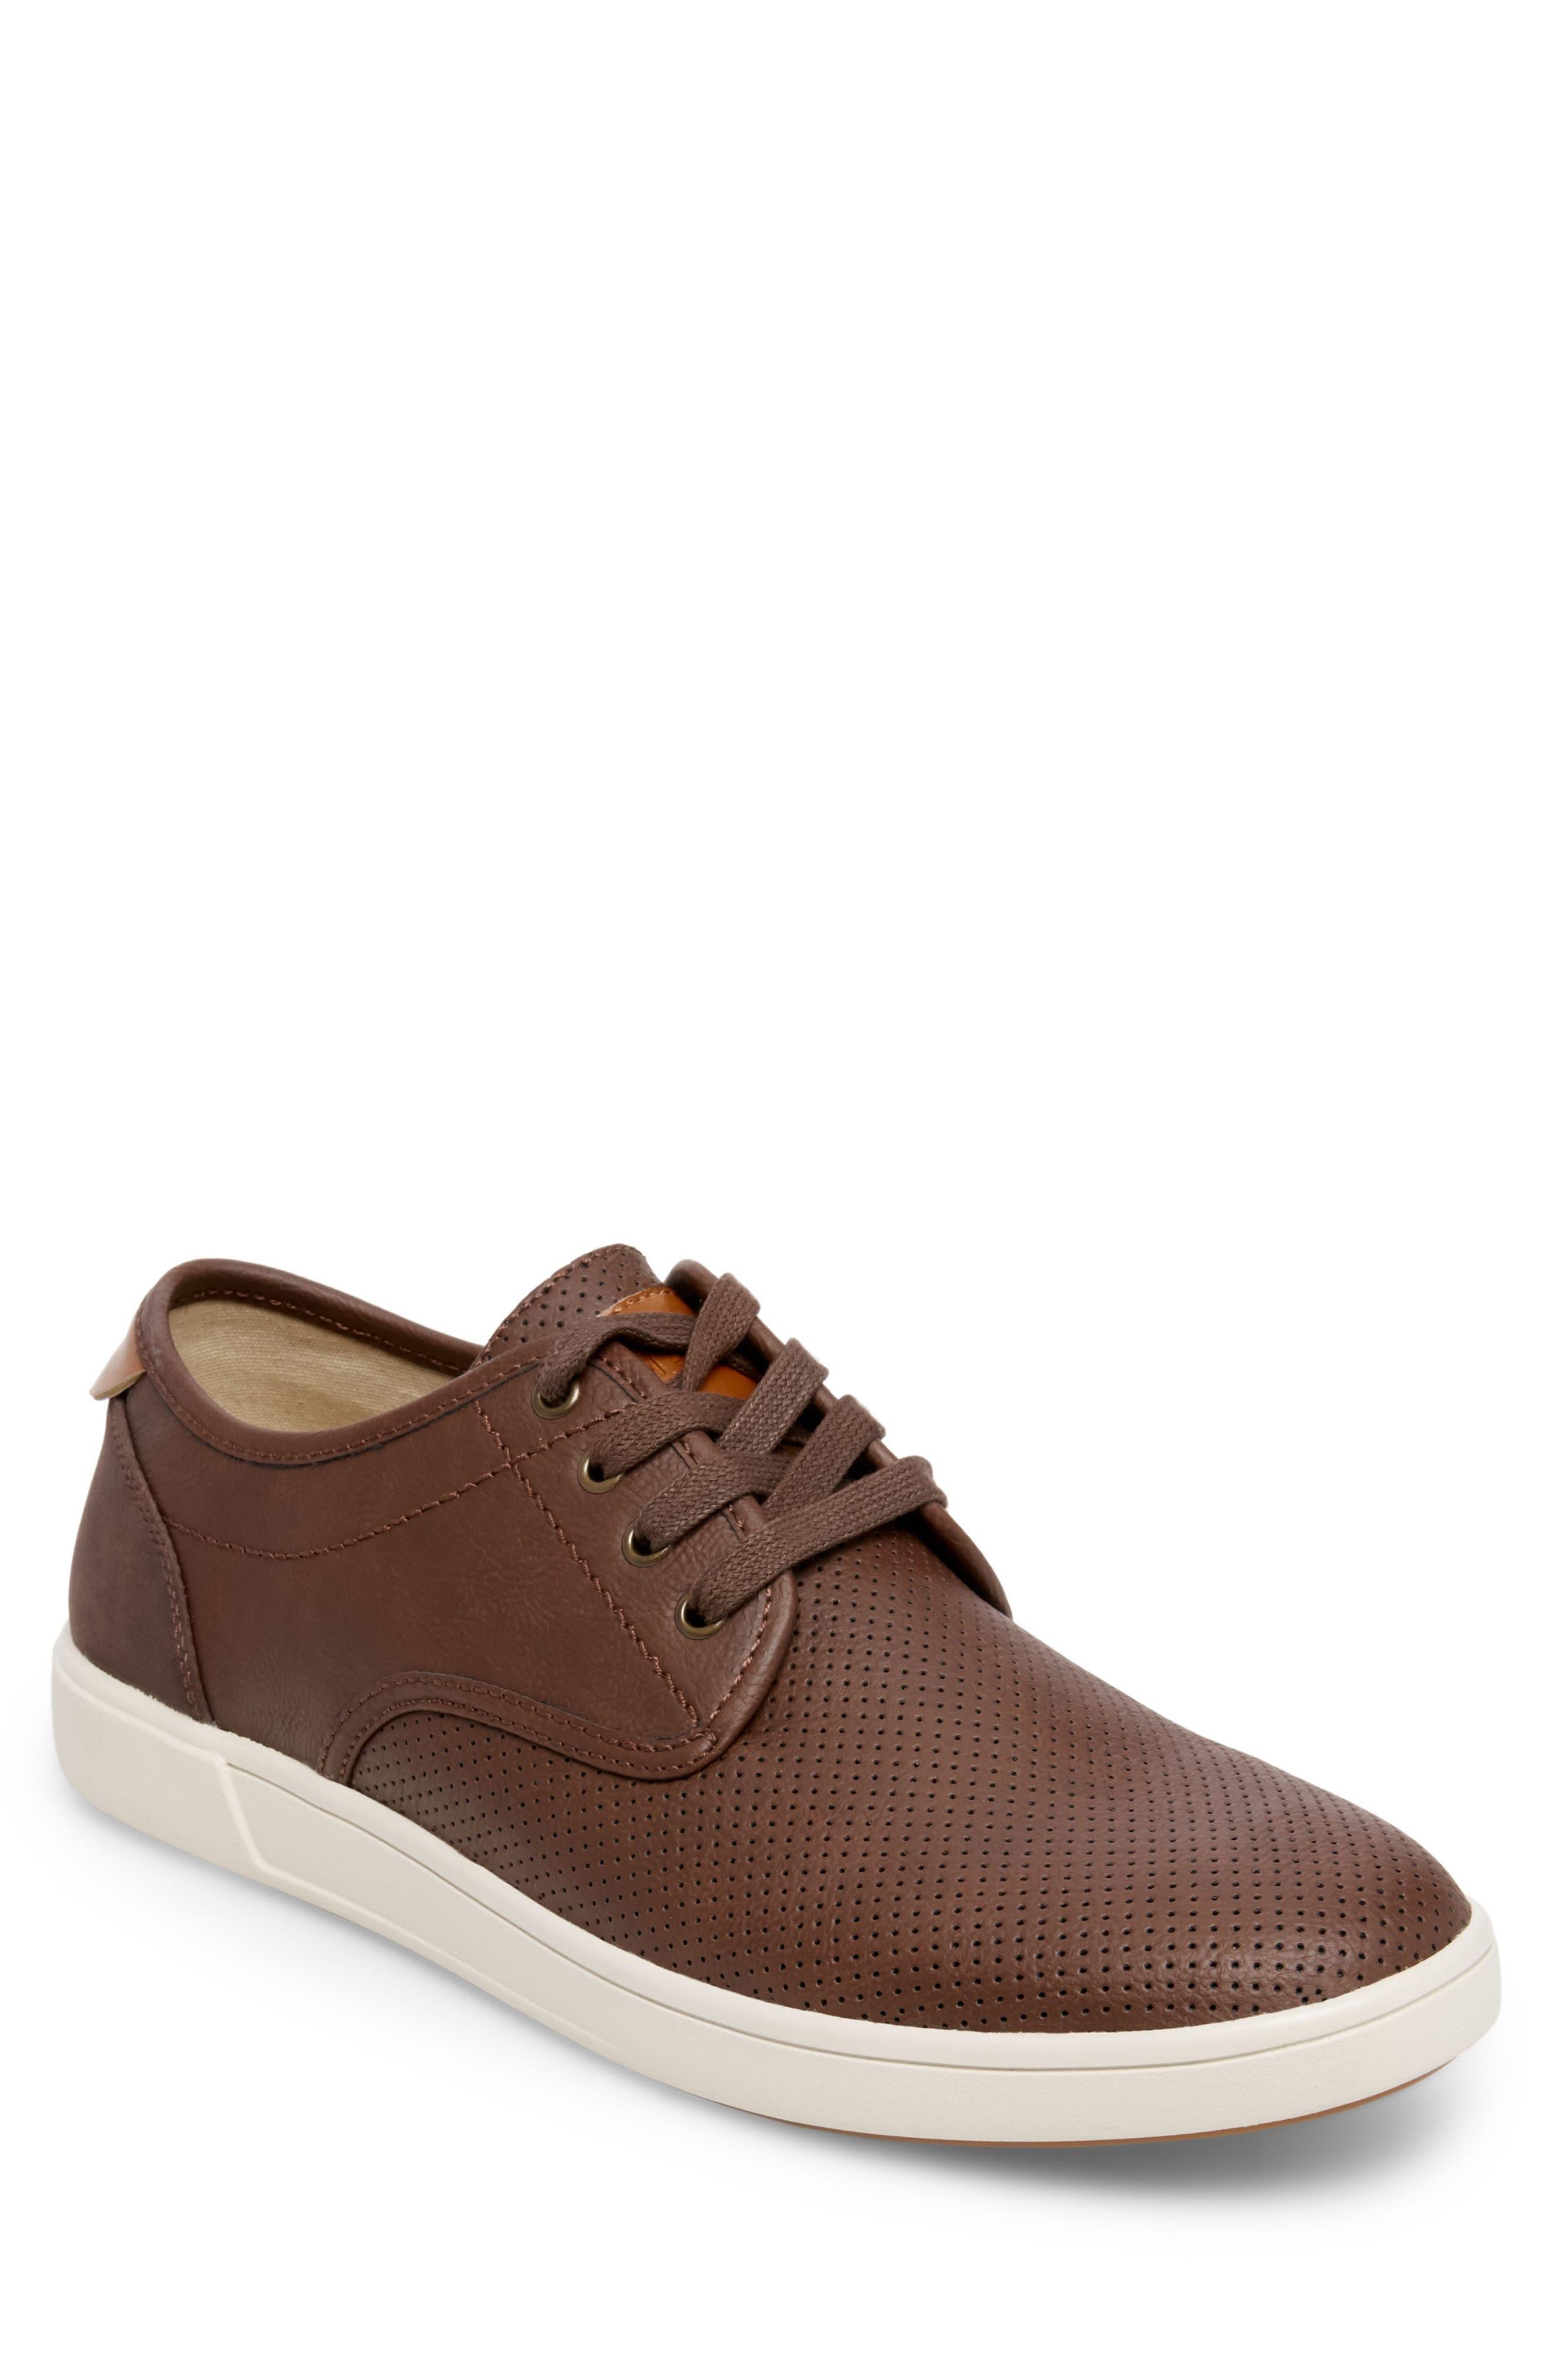 Flyerz Perforated Sneaker,                             Main thumbnail 1, color,                             Cognac